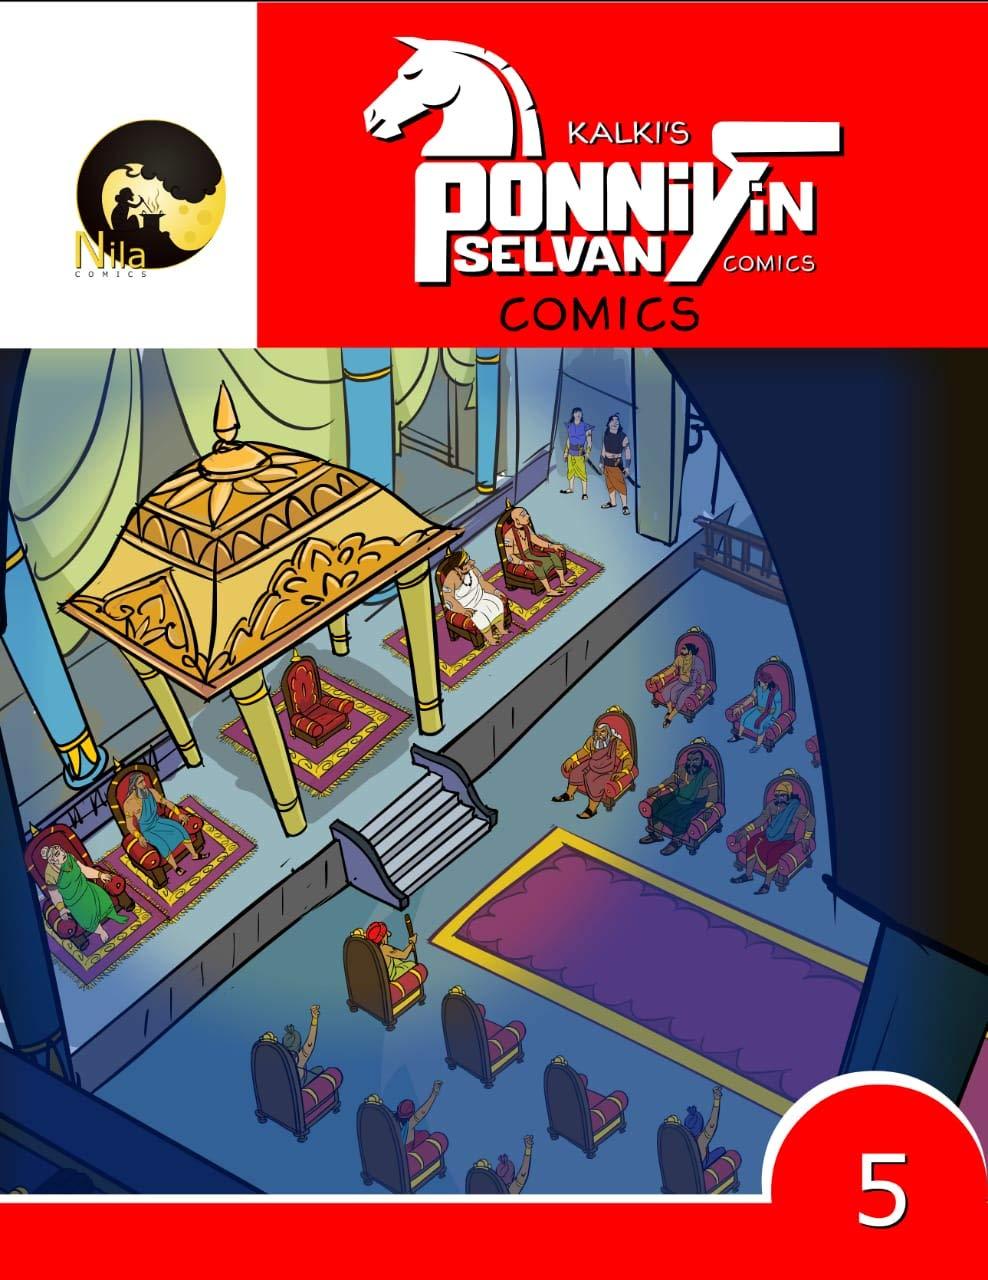 Kalki's Ponniyin Selvan Comics - Volume 5